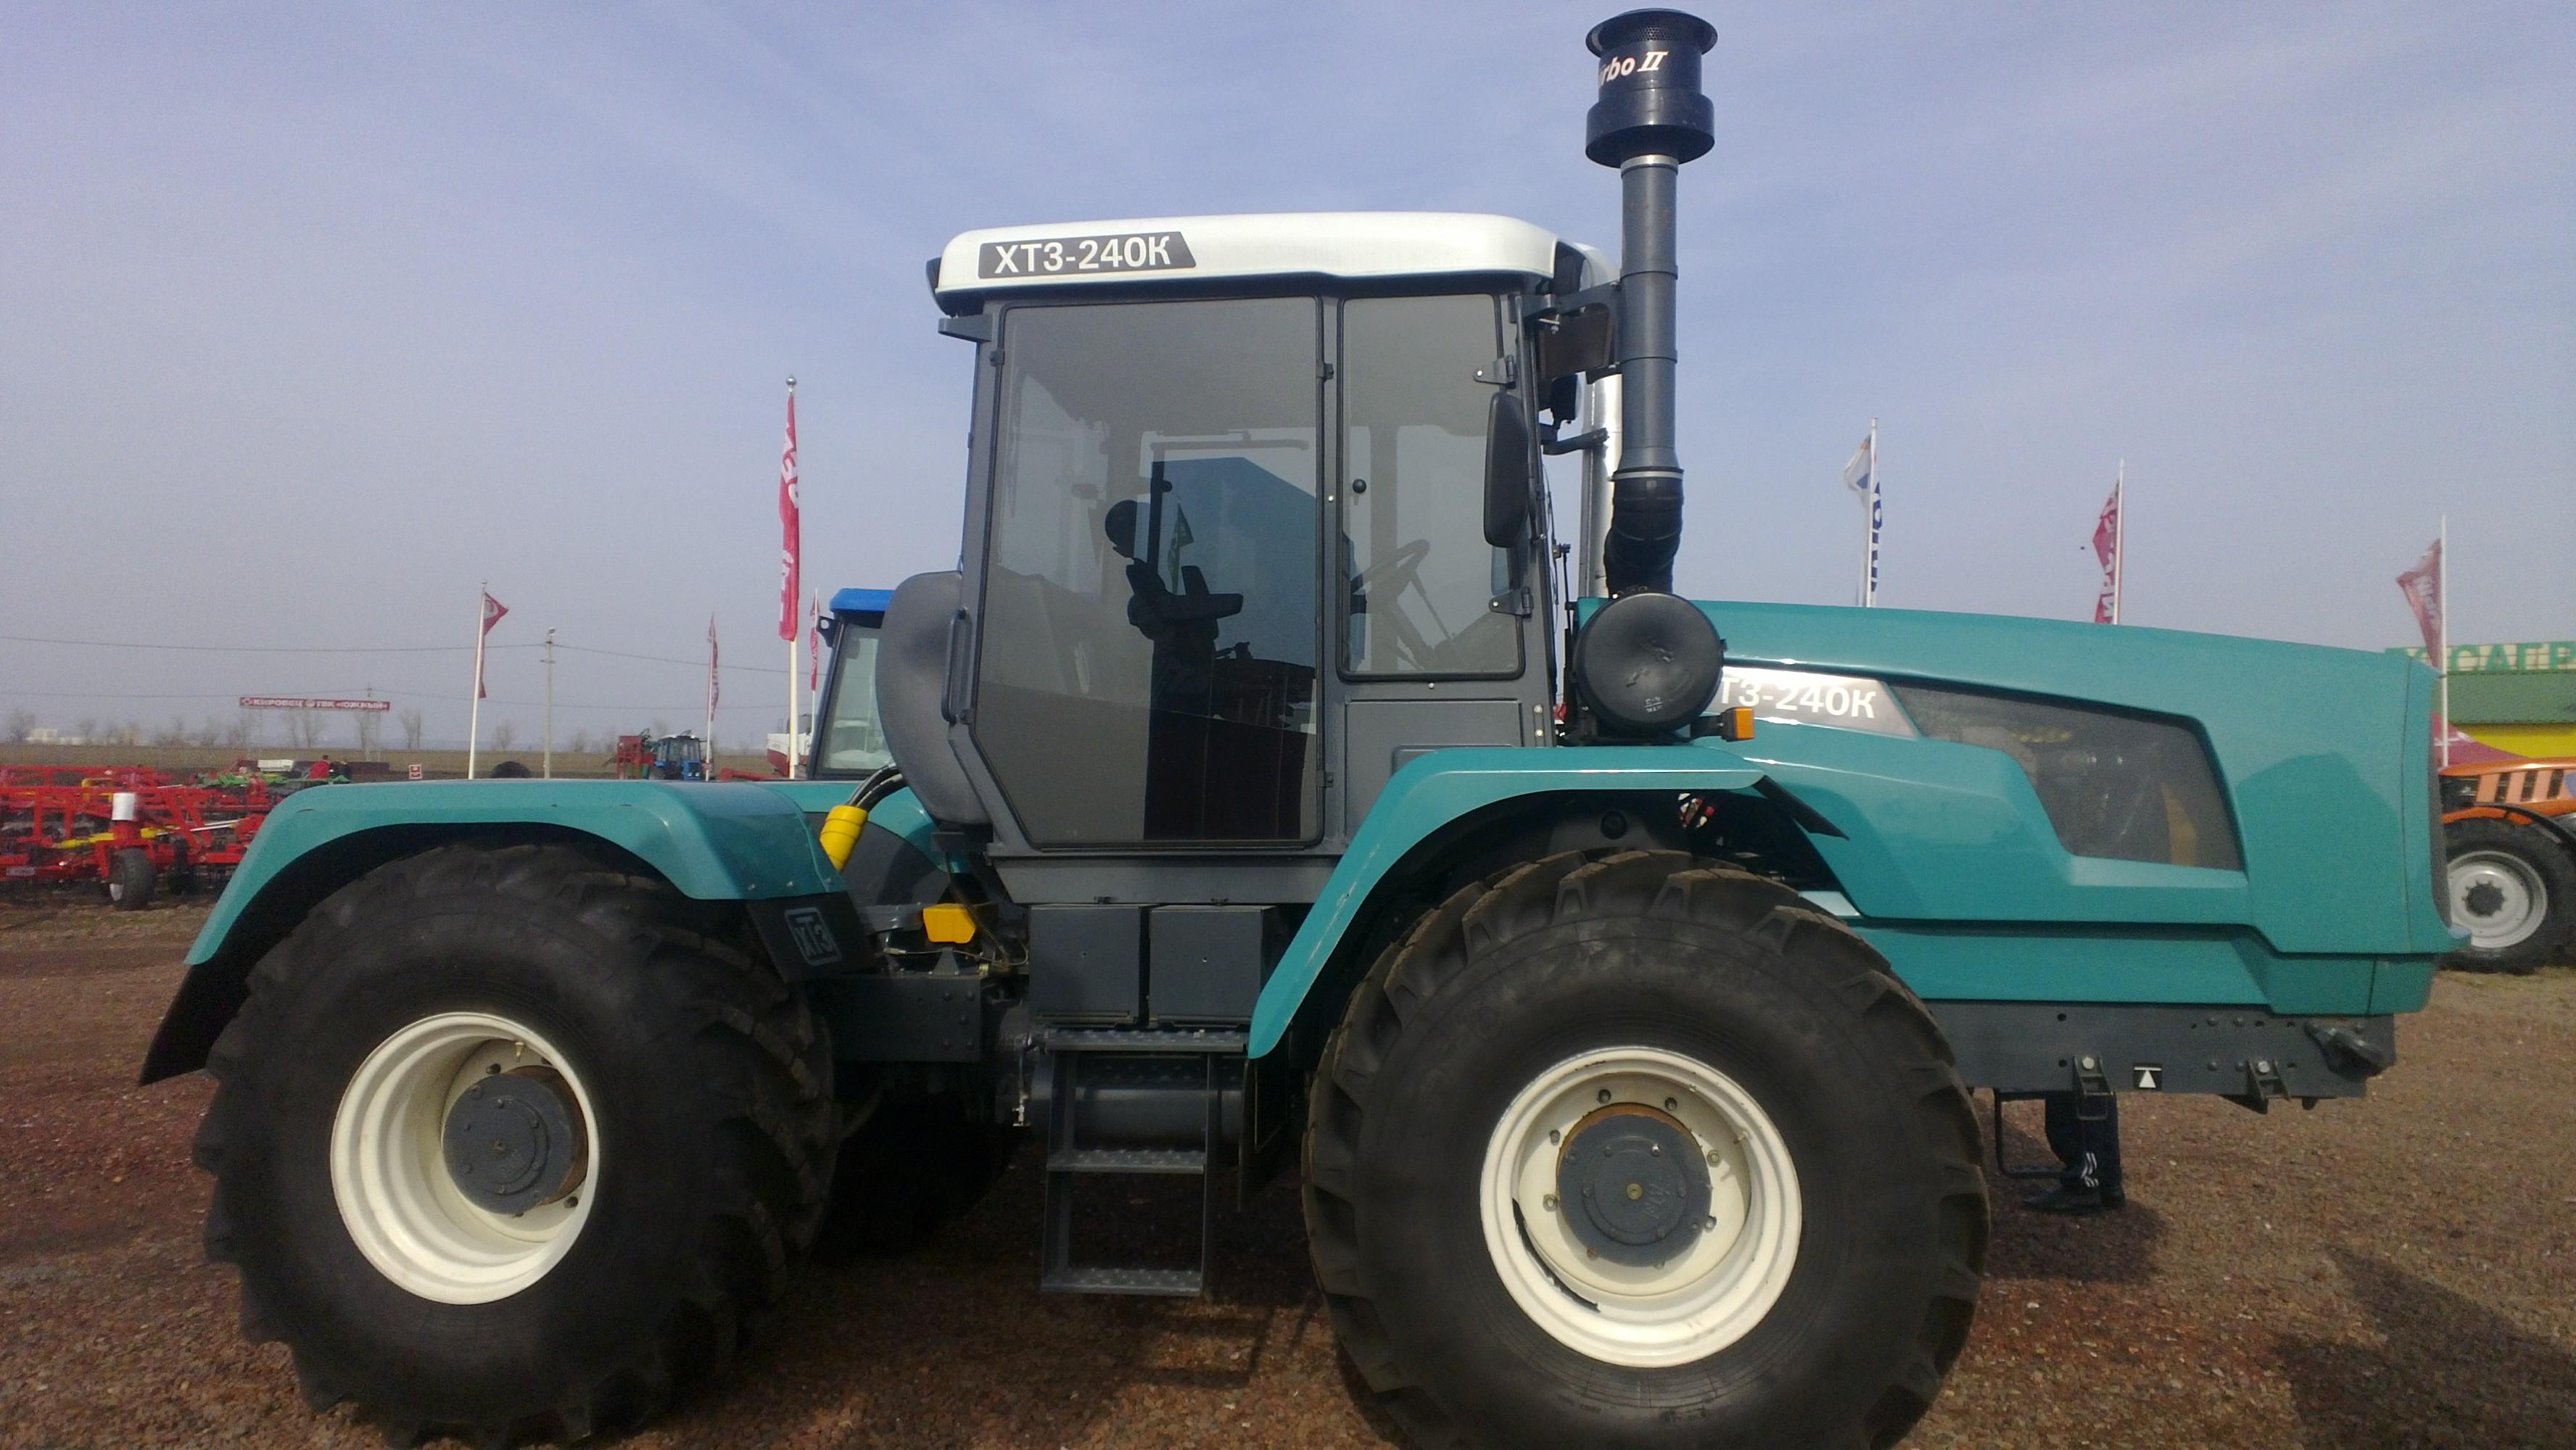 Трактора ртм-160 - girl15.trade